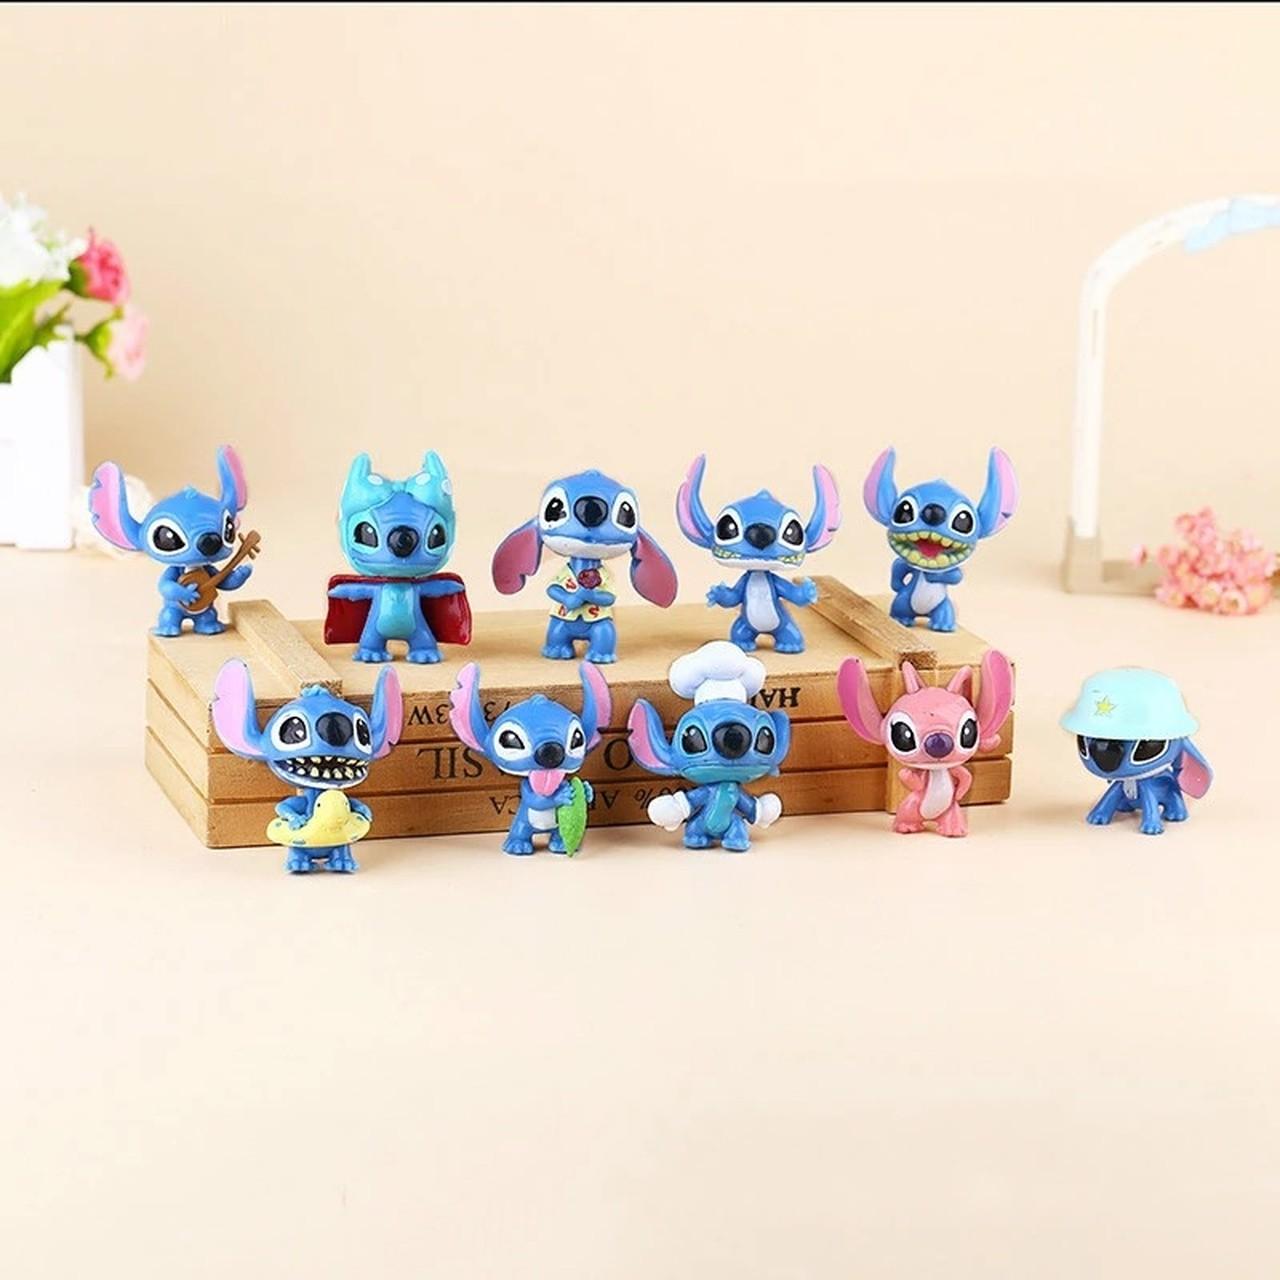 Pack Com 10 Mini Figuras Stitch: Lilo & Stitch  Escala 1/60 - Disney - MKP